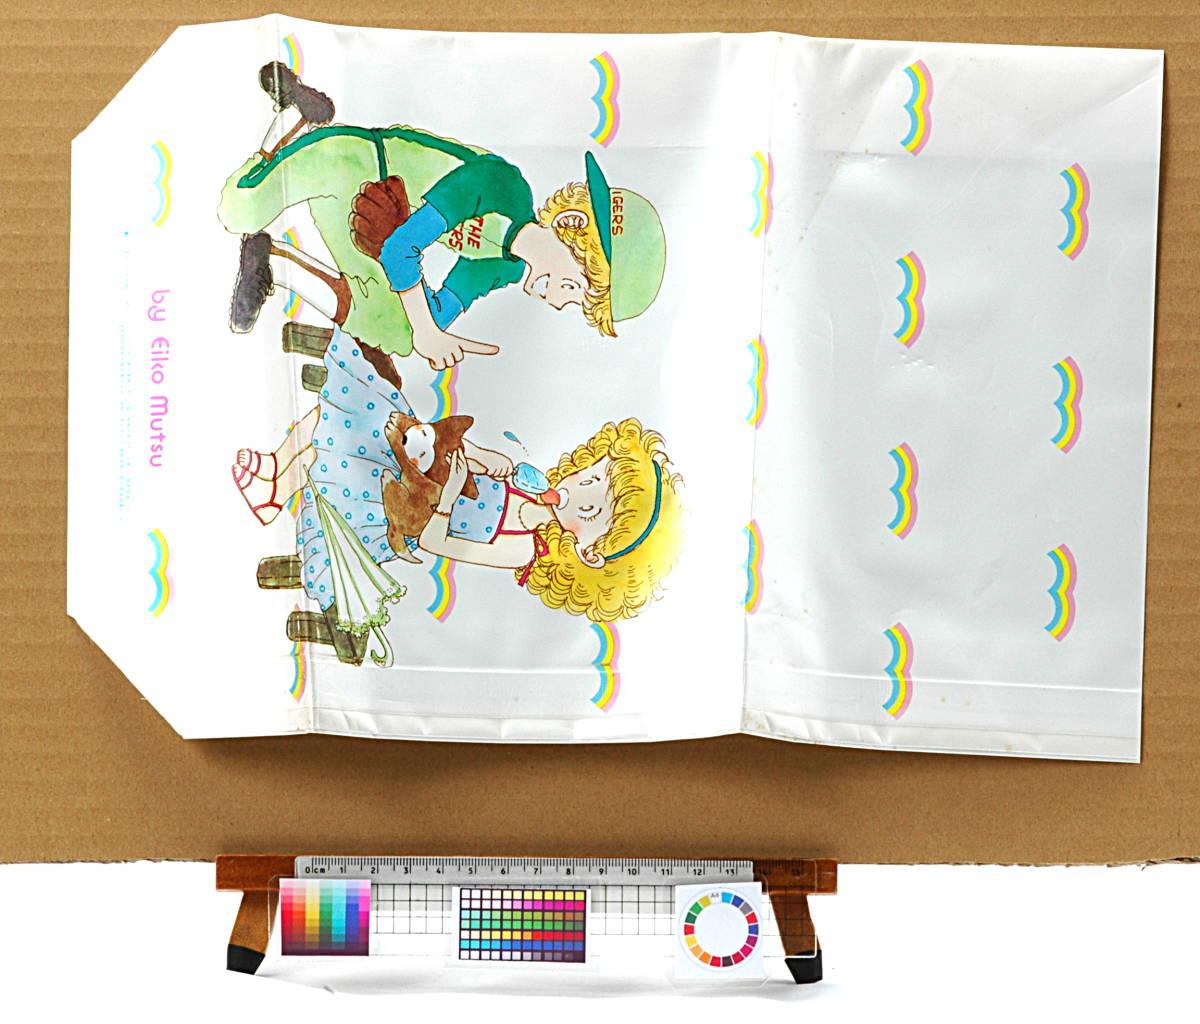 [Vintage] [New Item] [Delivery Free]1980s Ribbon Issued Mutsu Ako Gazette Bag りぼん付録 陸奥 A子 ガゼット袋(ビニール小物入れ)_画像5